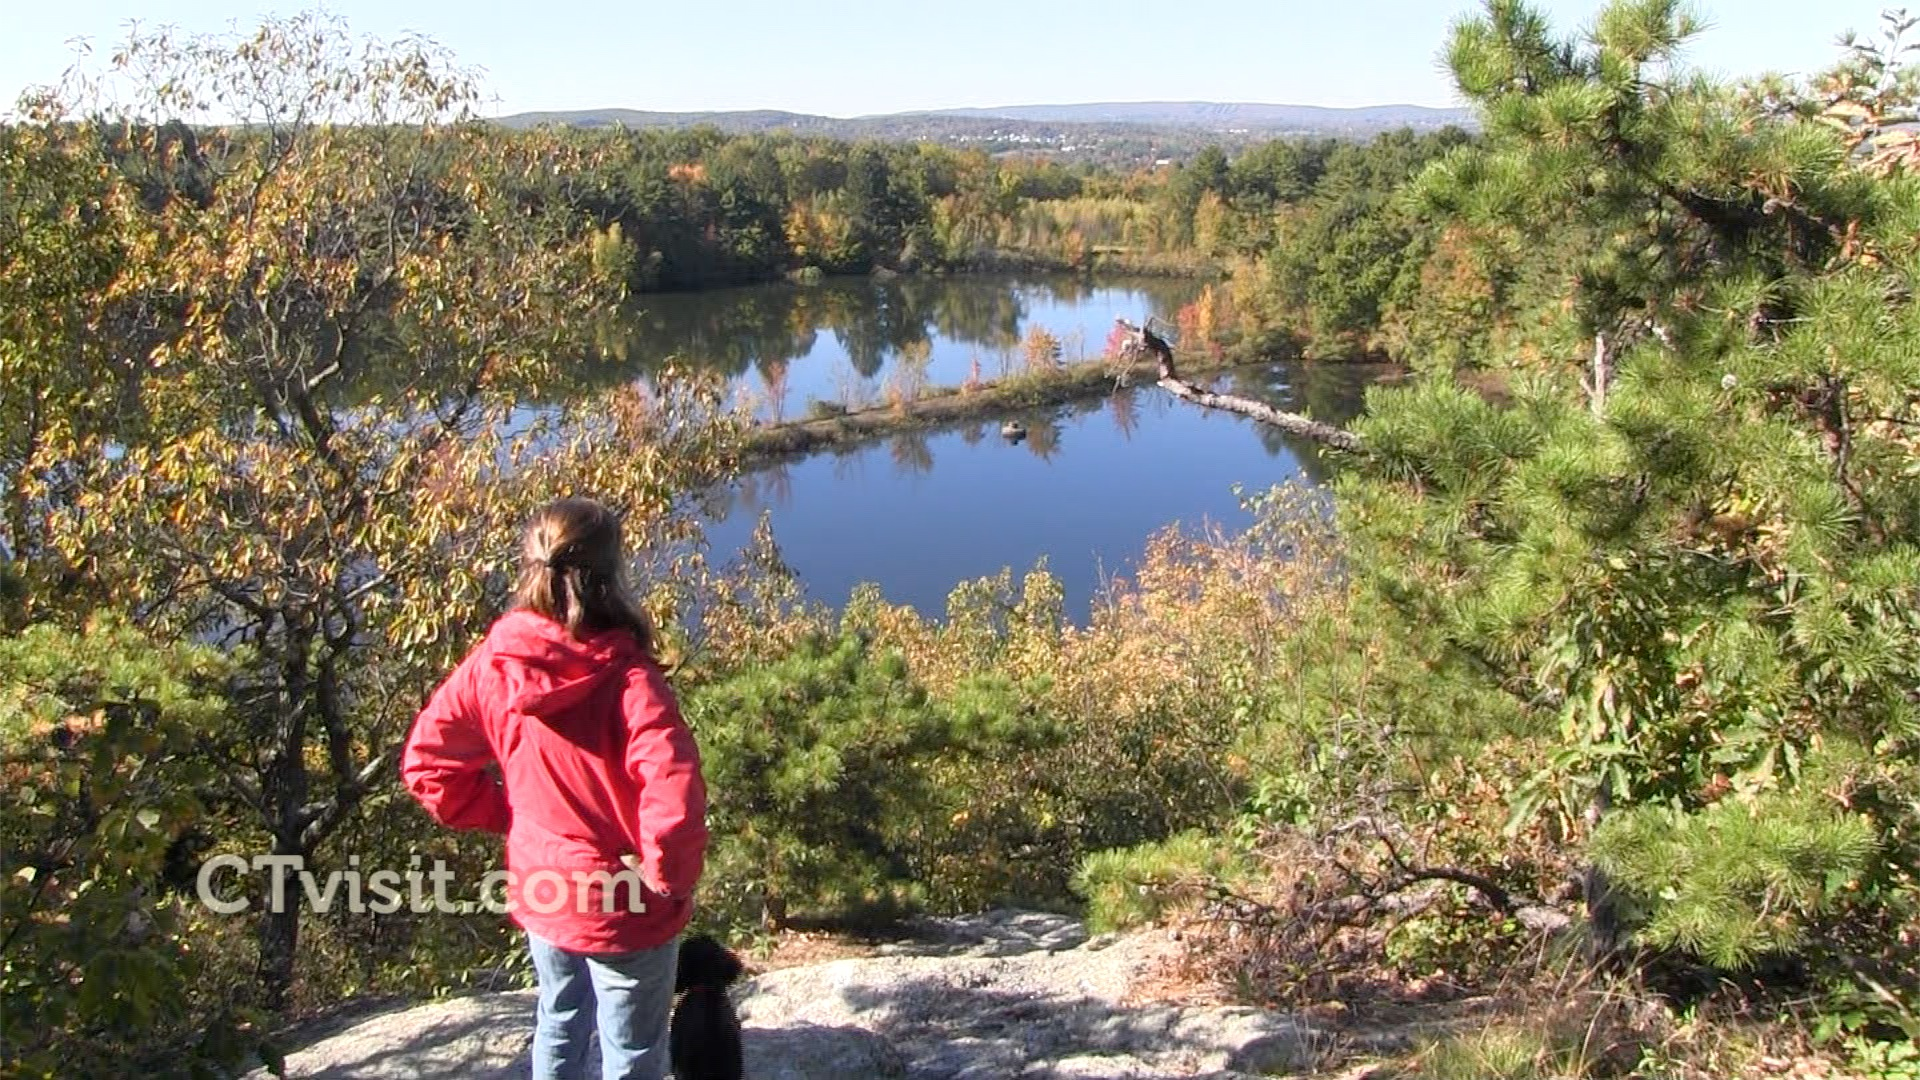 Mattabesett Trail - Reservoirs